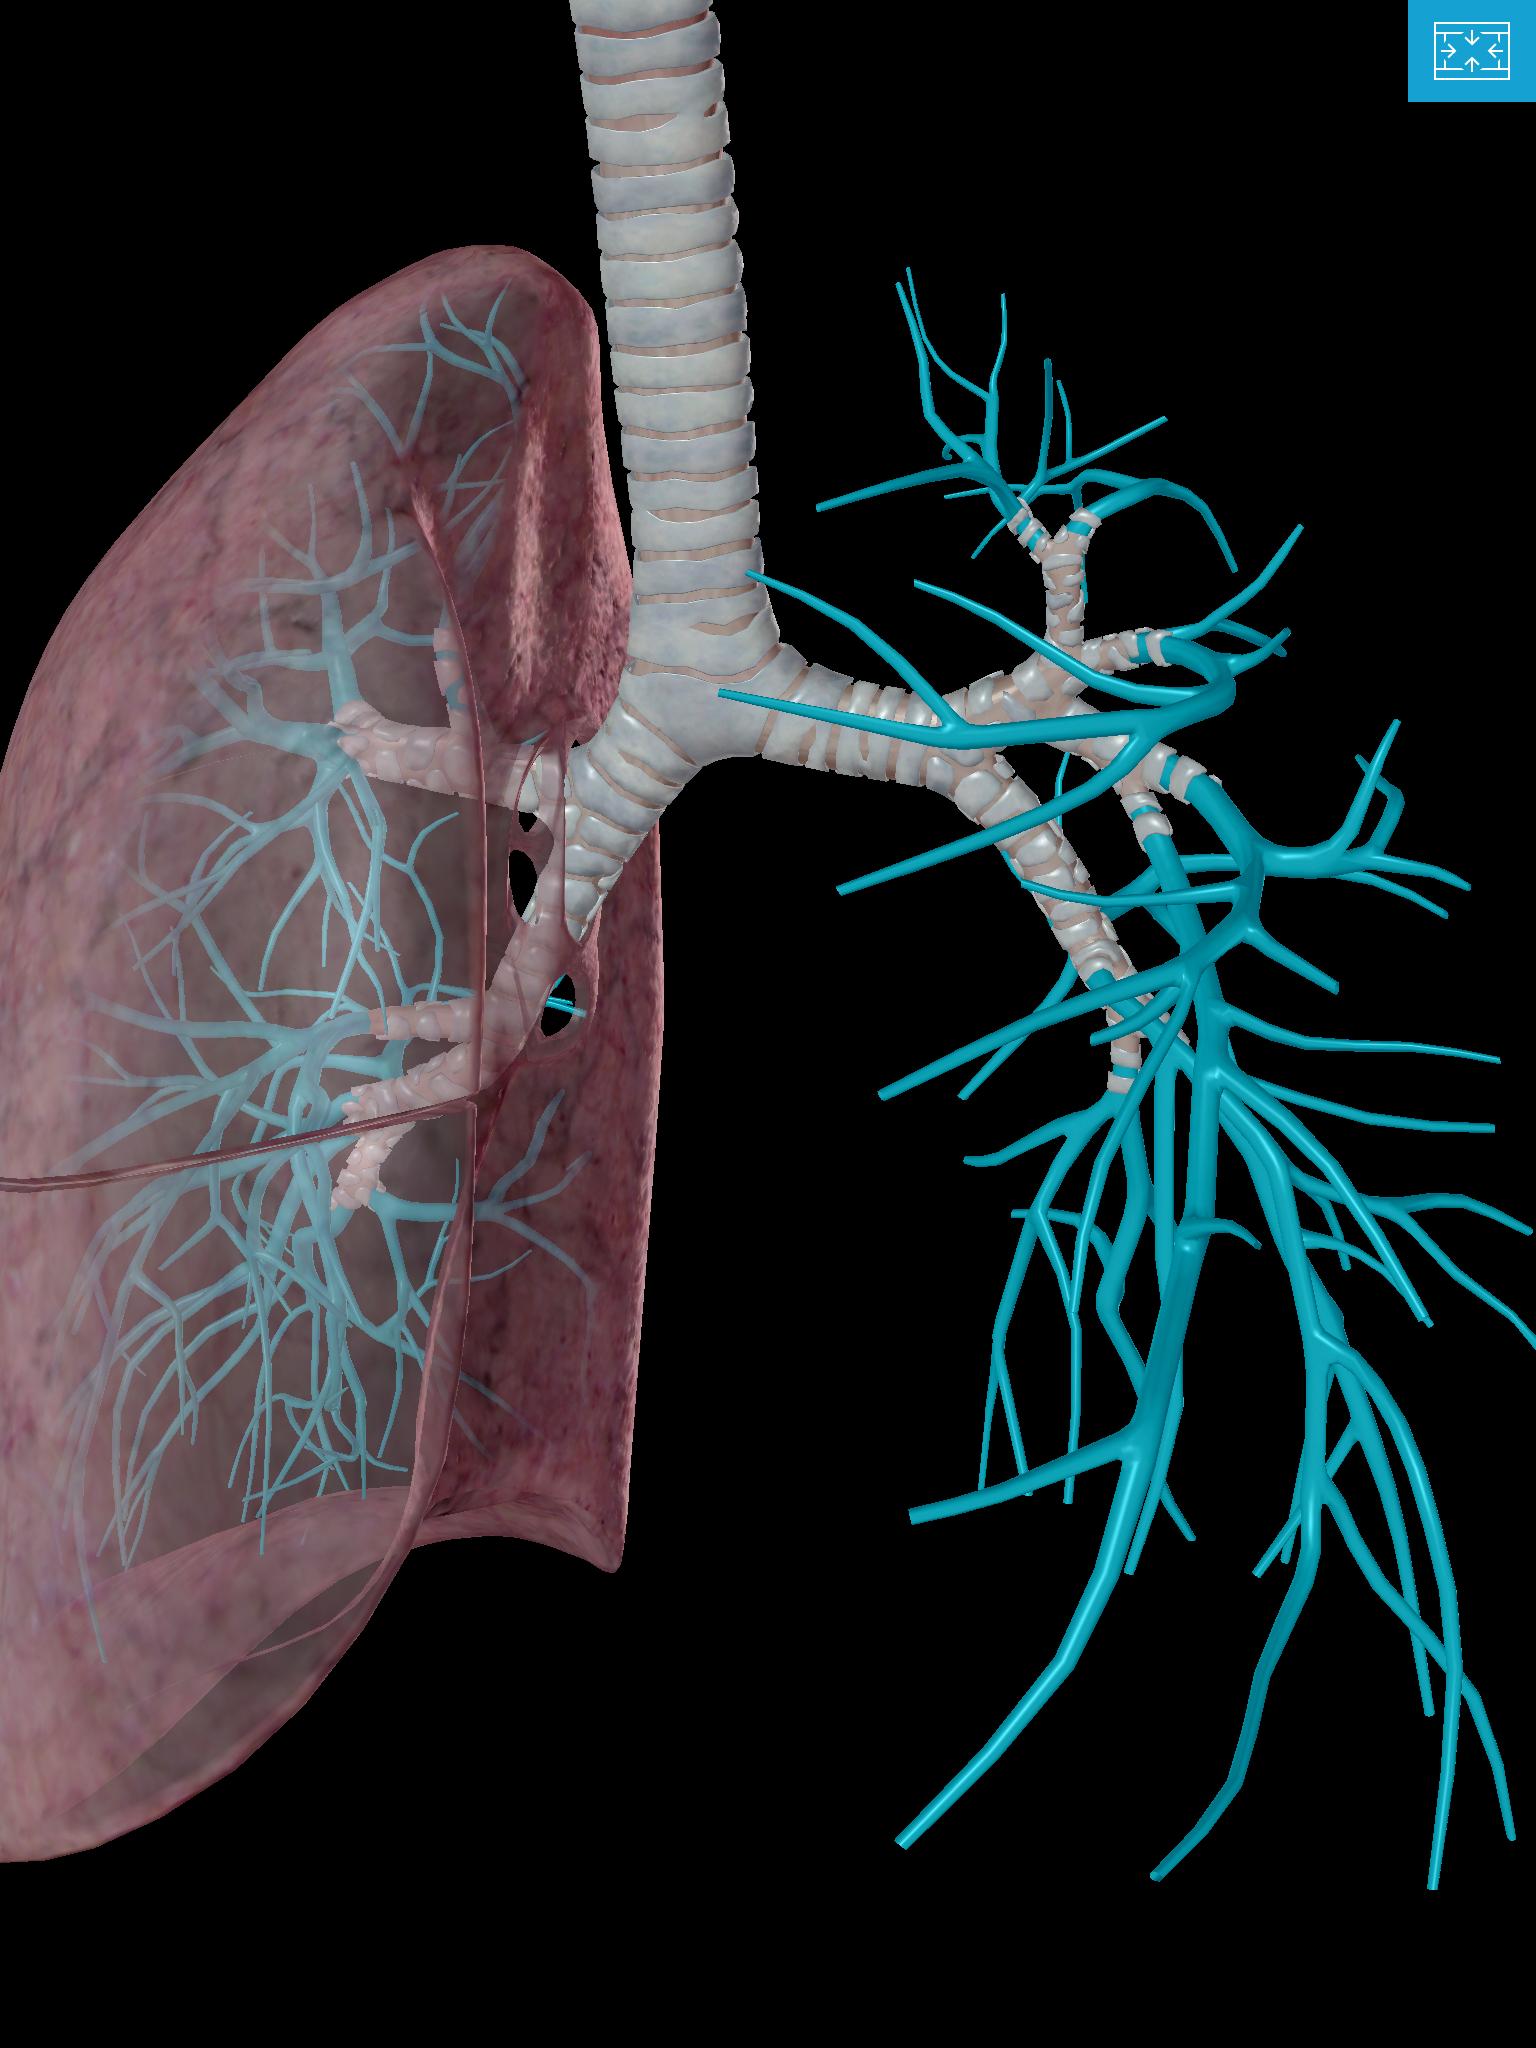 Lower-Respiratory-system-lungs-tertiary-segmental-bronchus-Bronchioles-alveoli.png